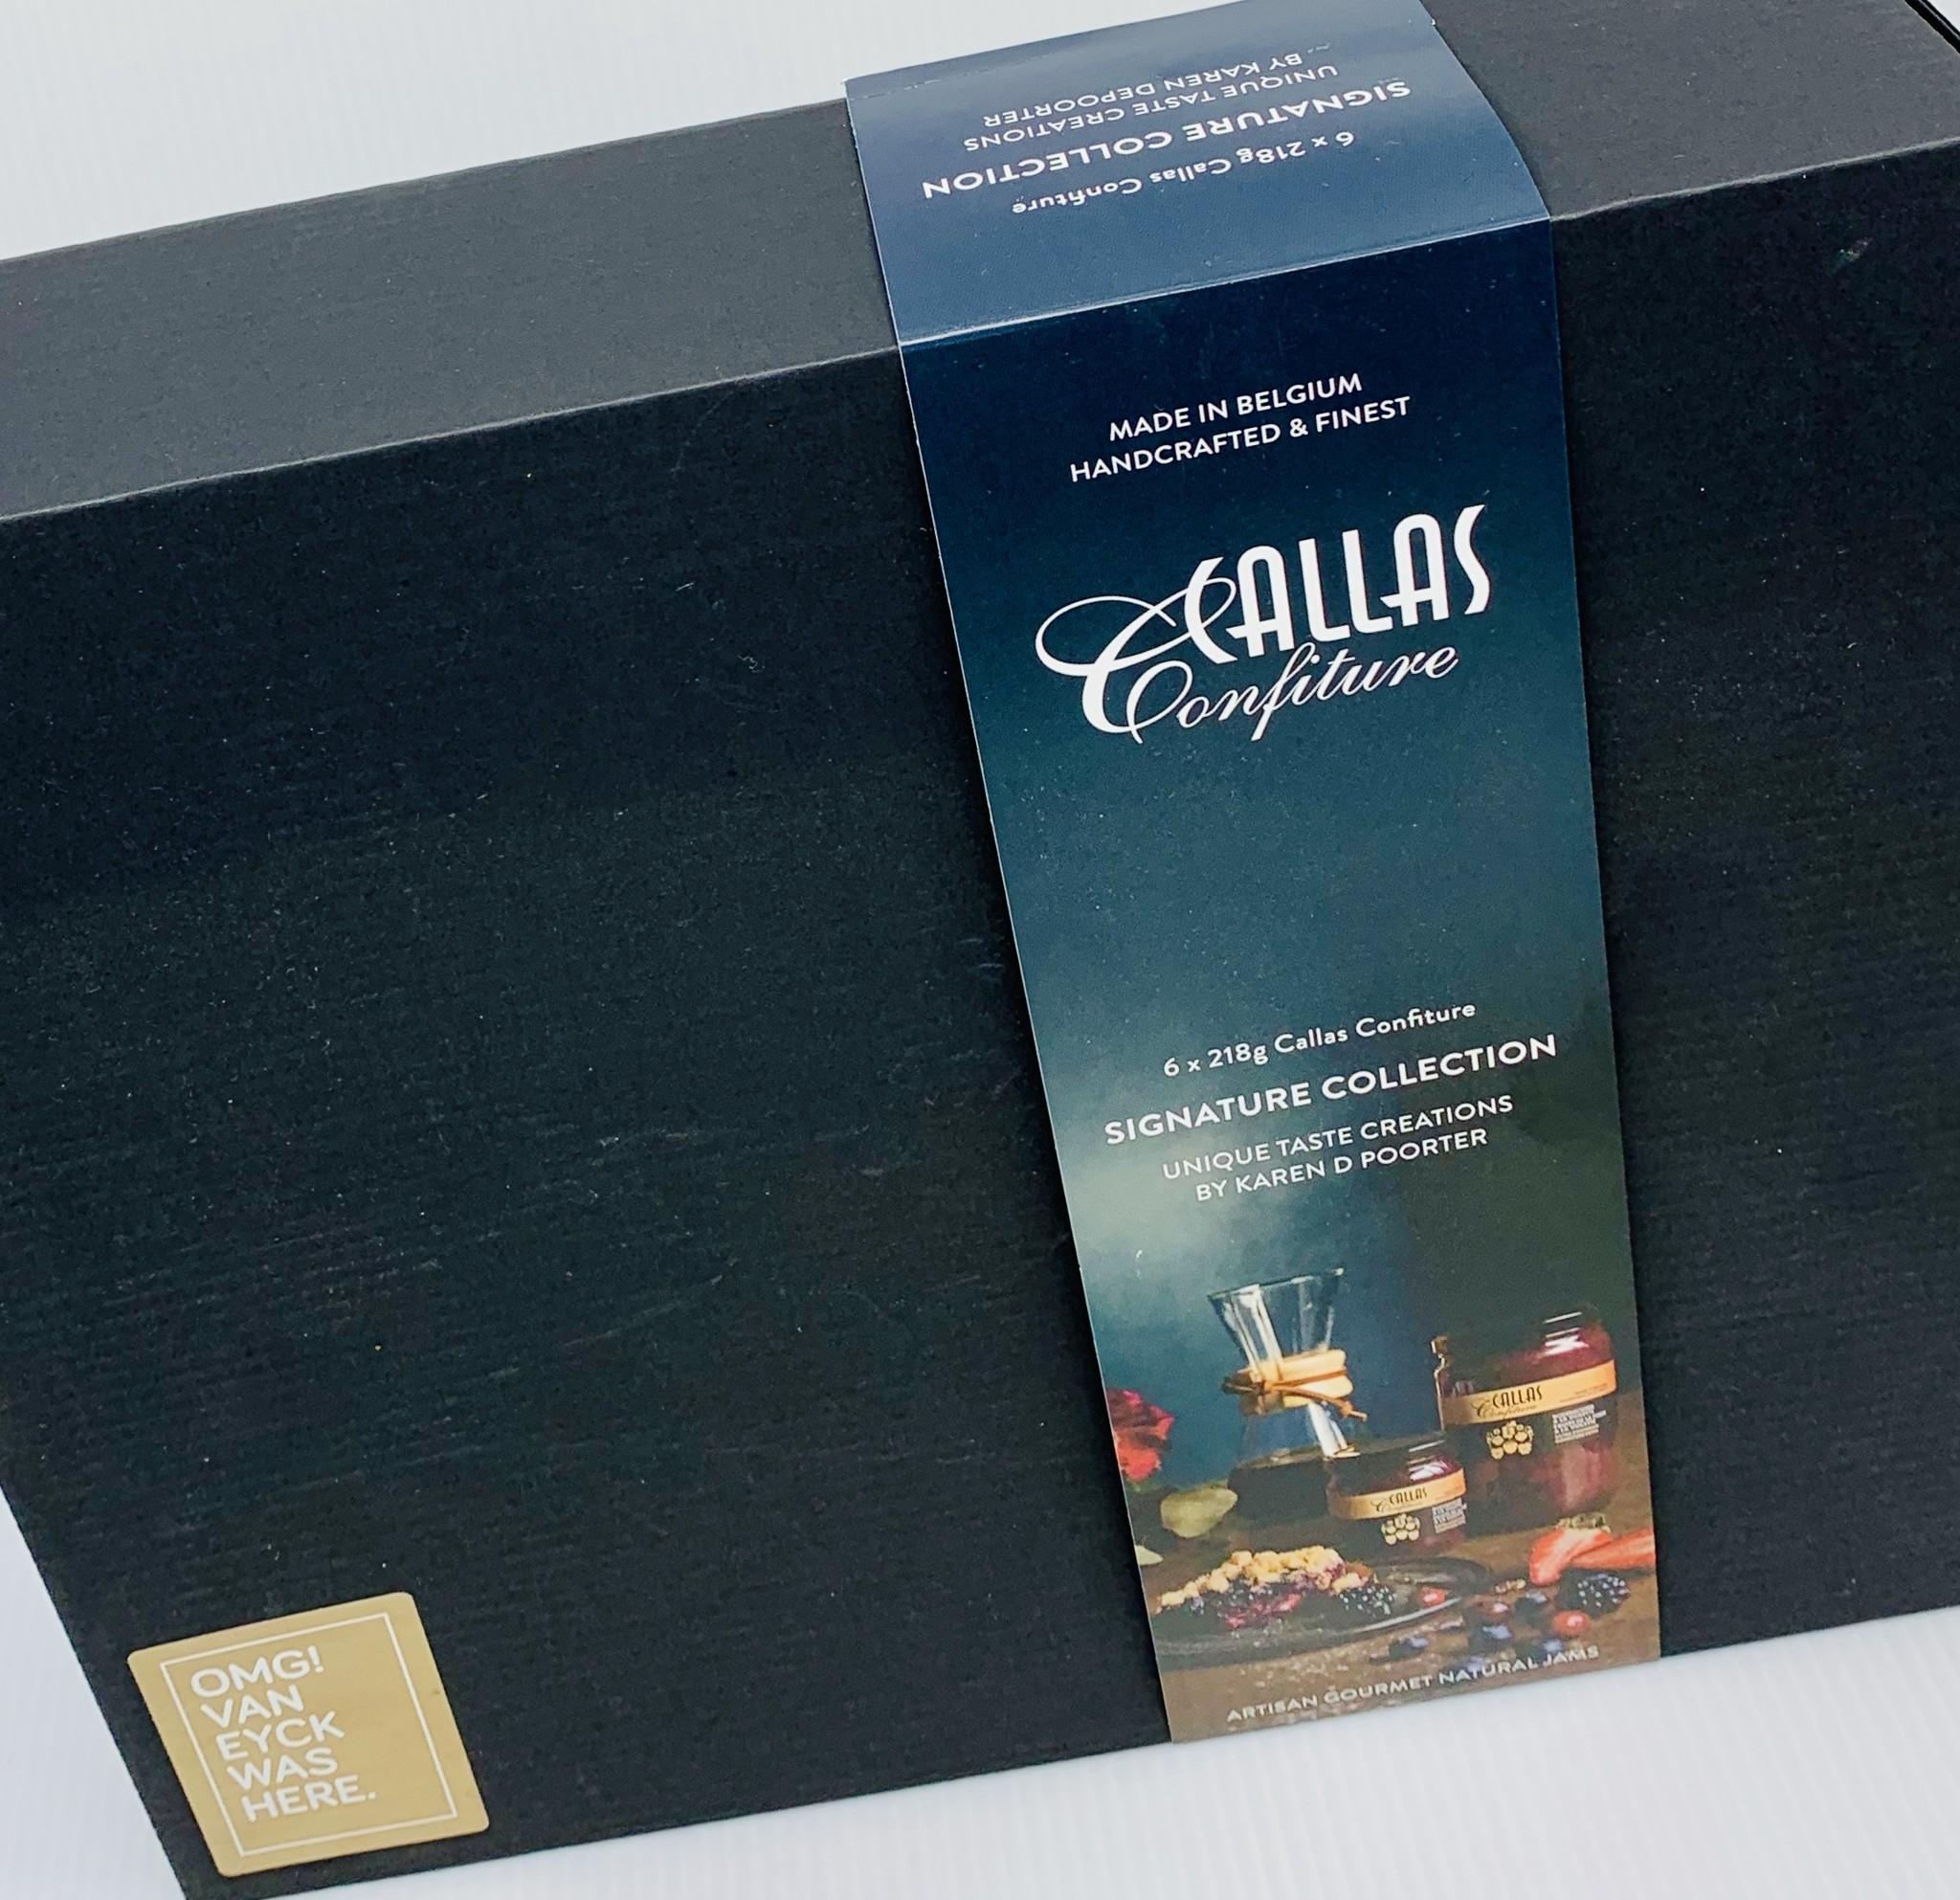 Van Eyck shop Luxe doos confituur - Callas Confiture